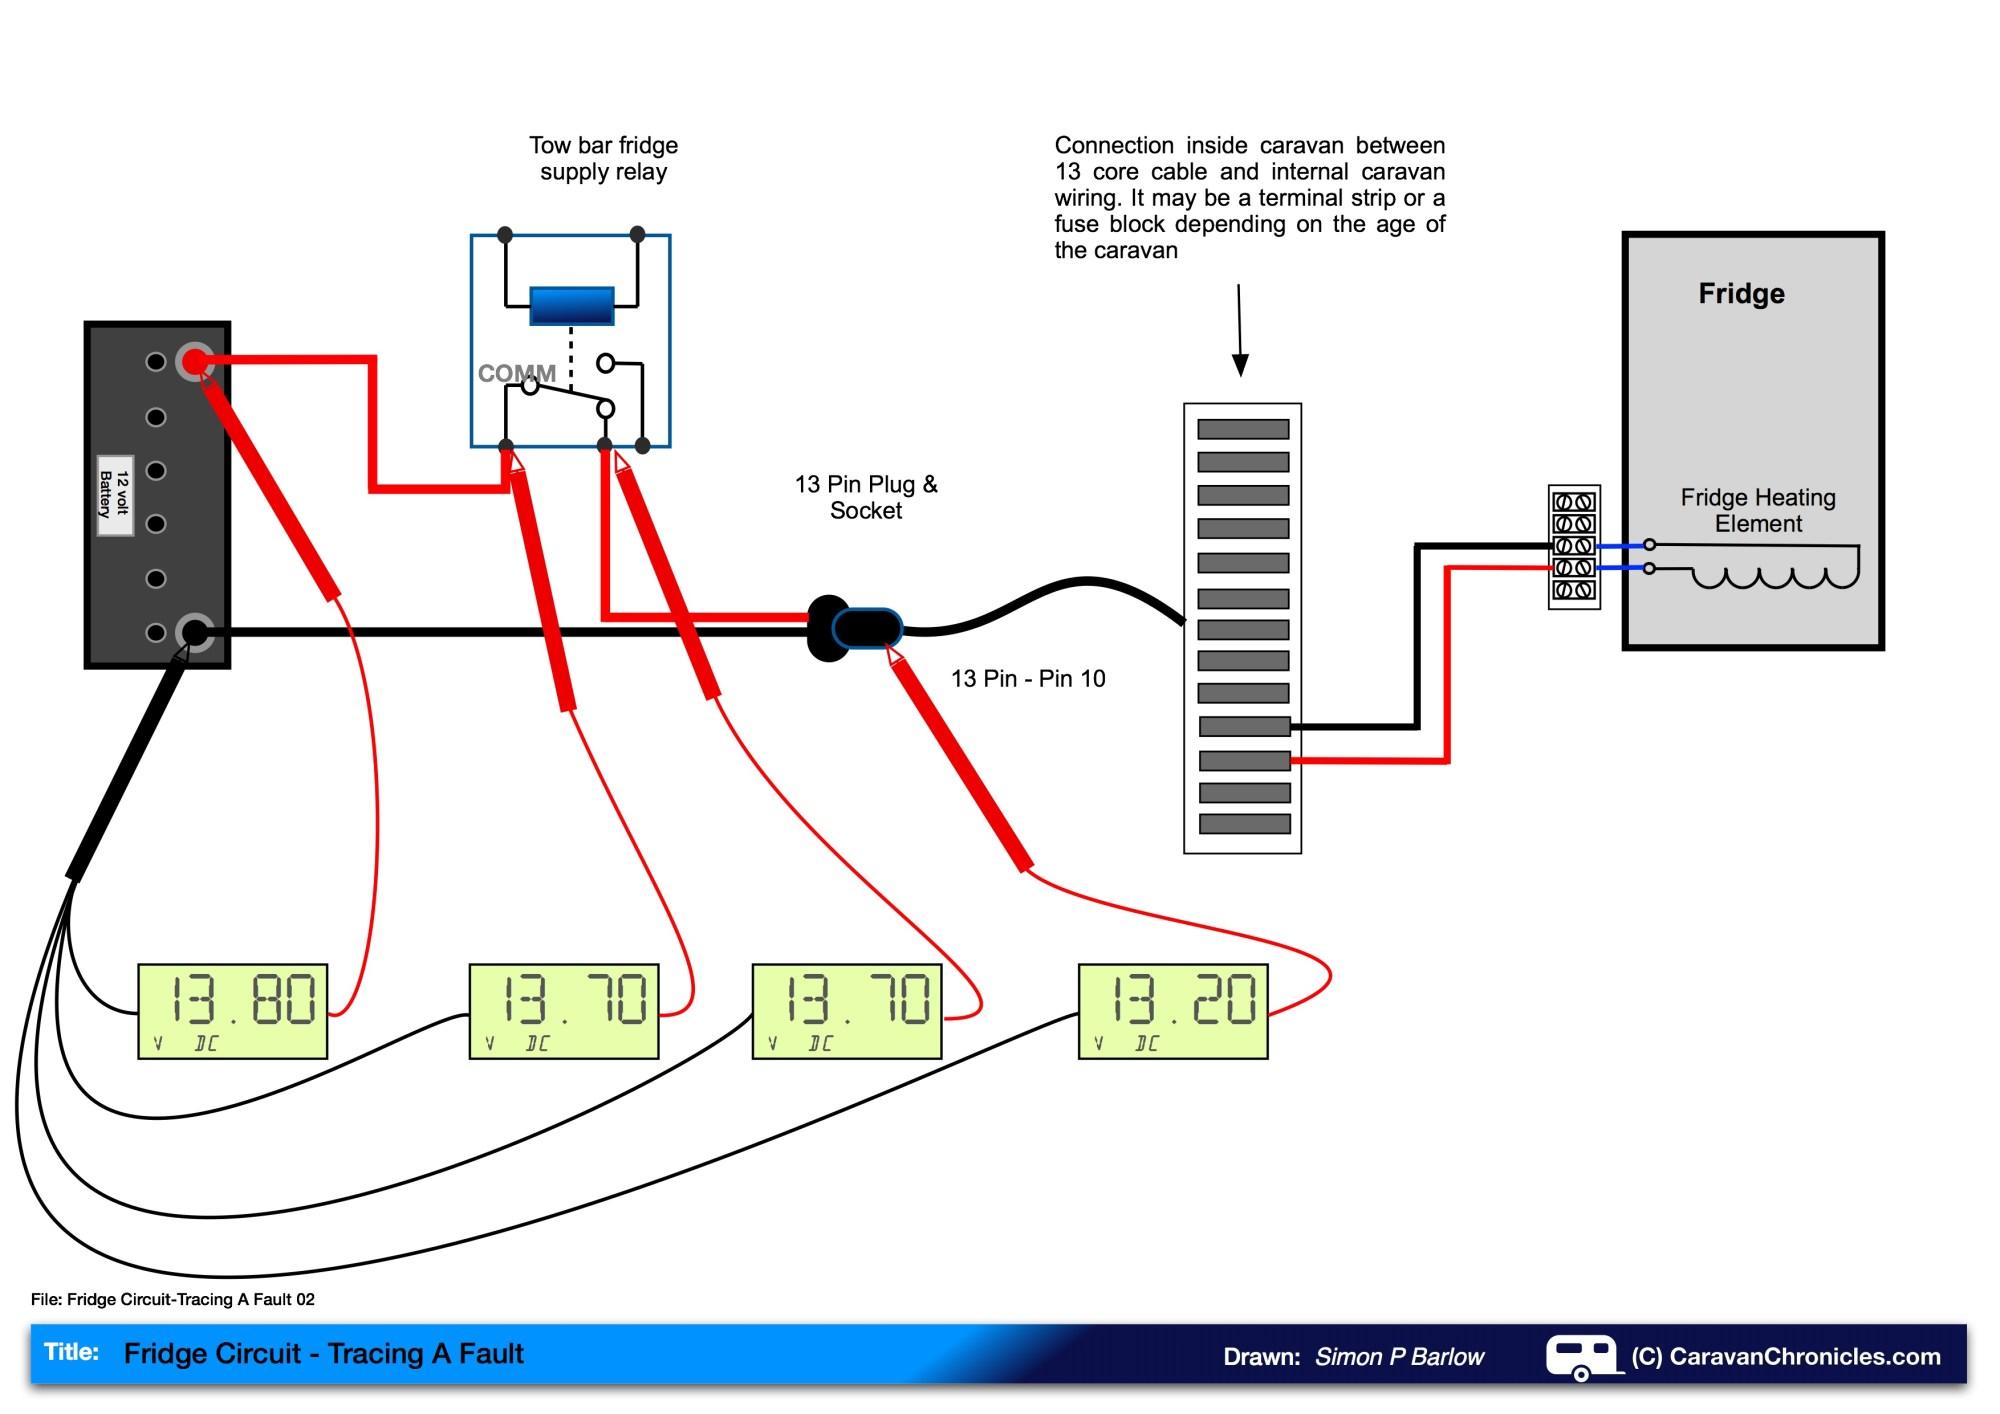 hight resolution of kramer striker 300st wiring diagram wiring librarytrailer wiring diagrams caravan fridge circuit u2013 tracing